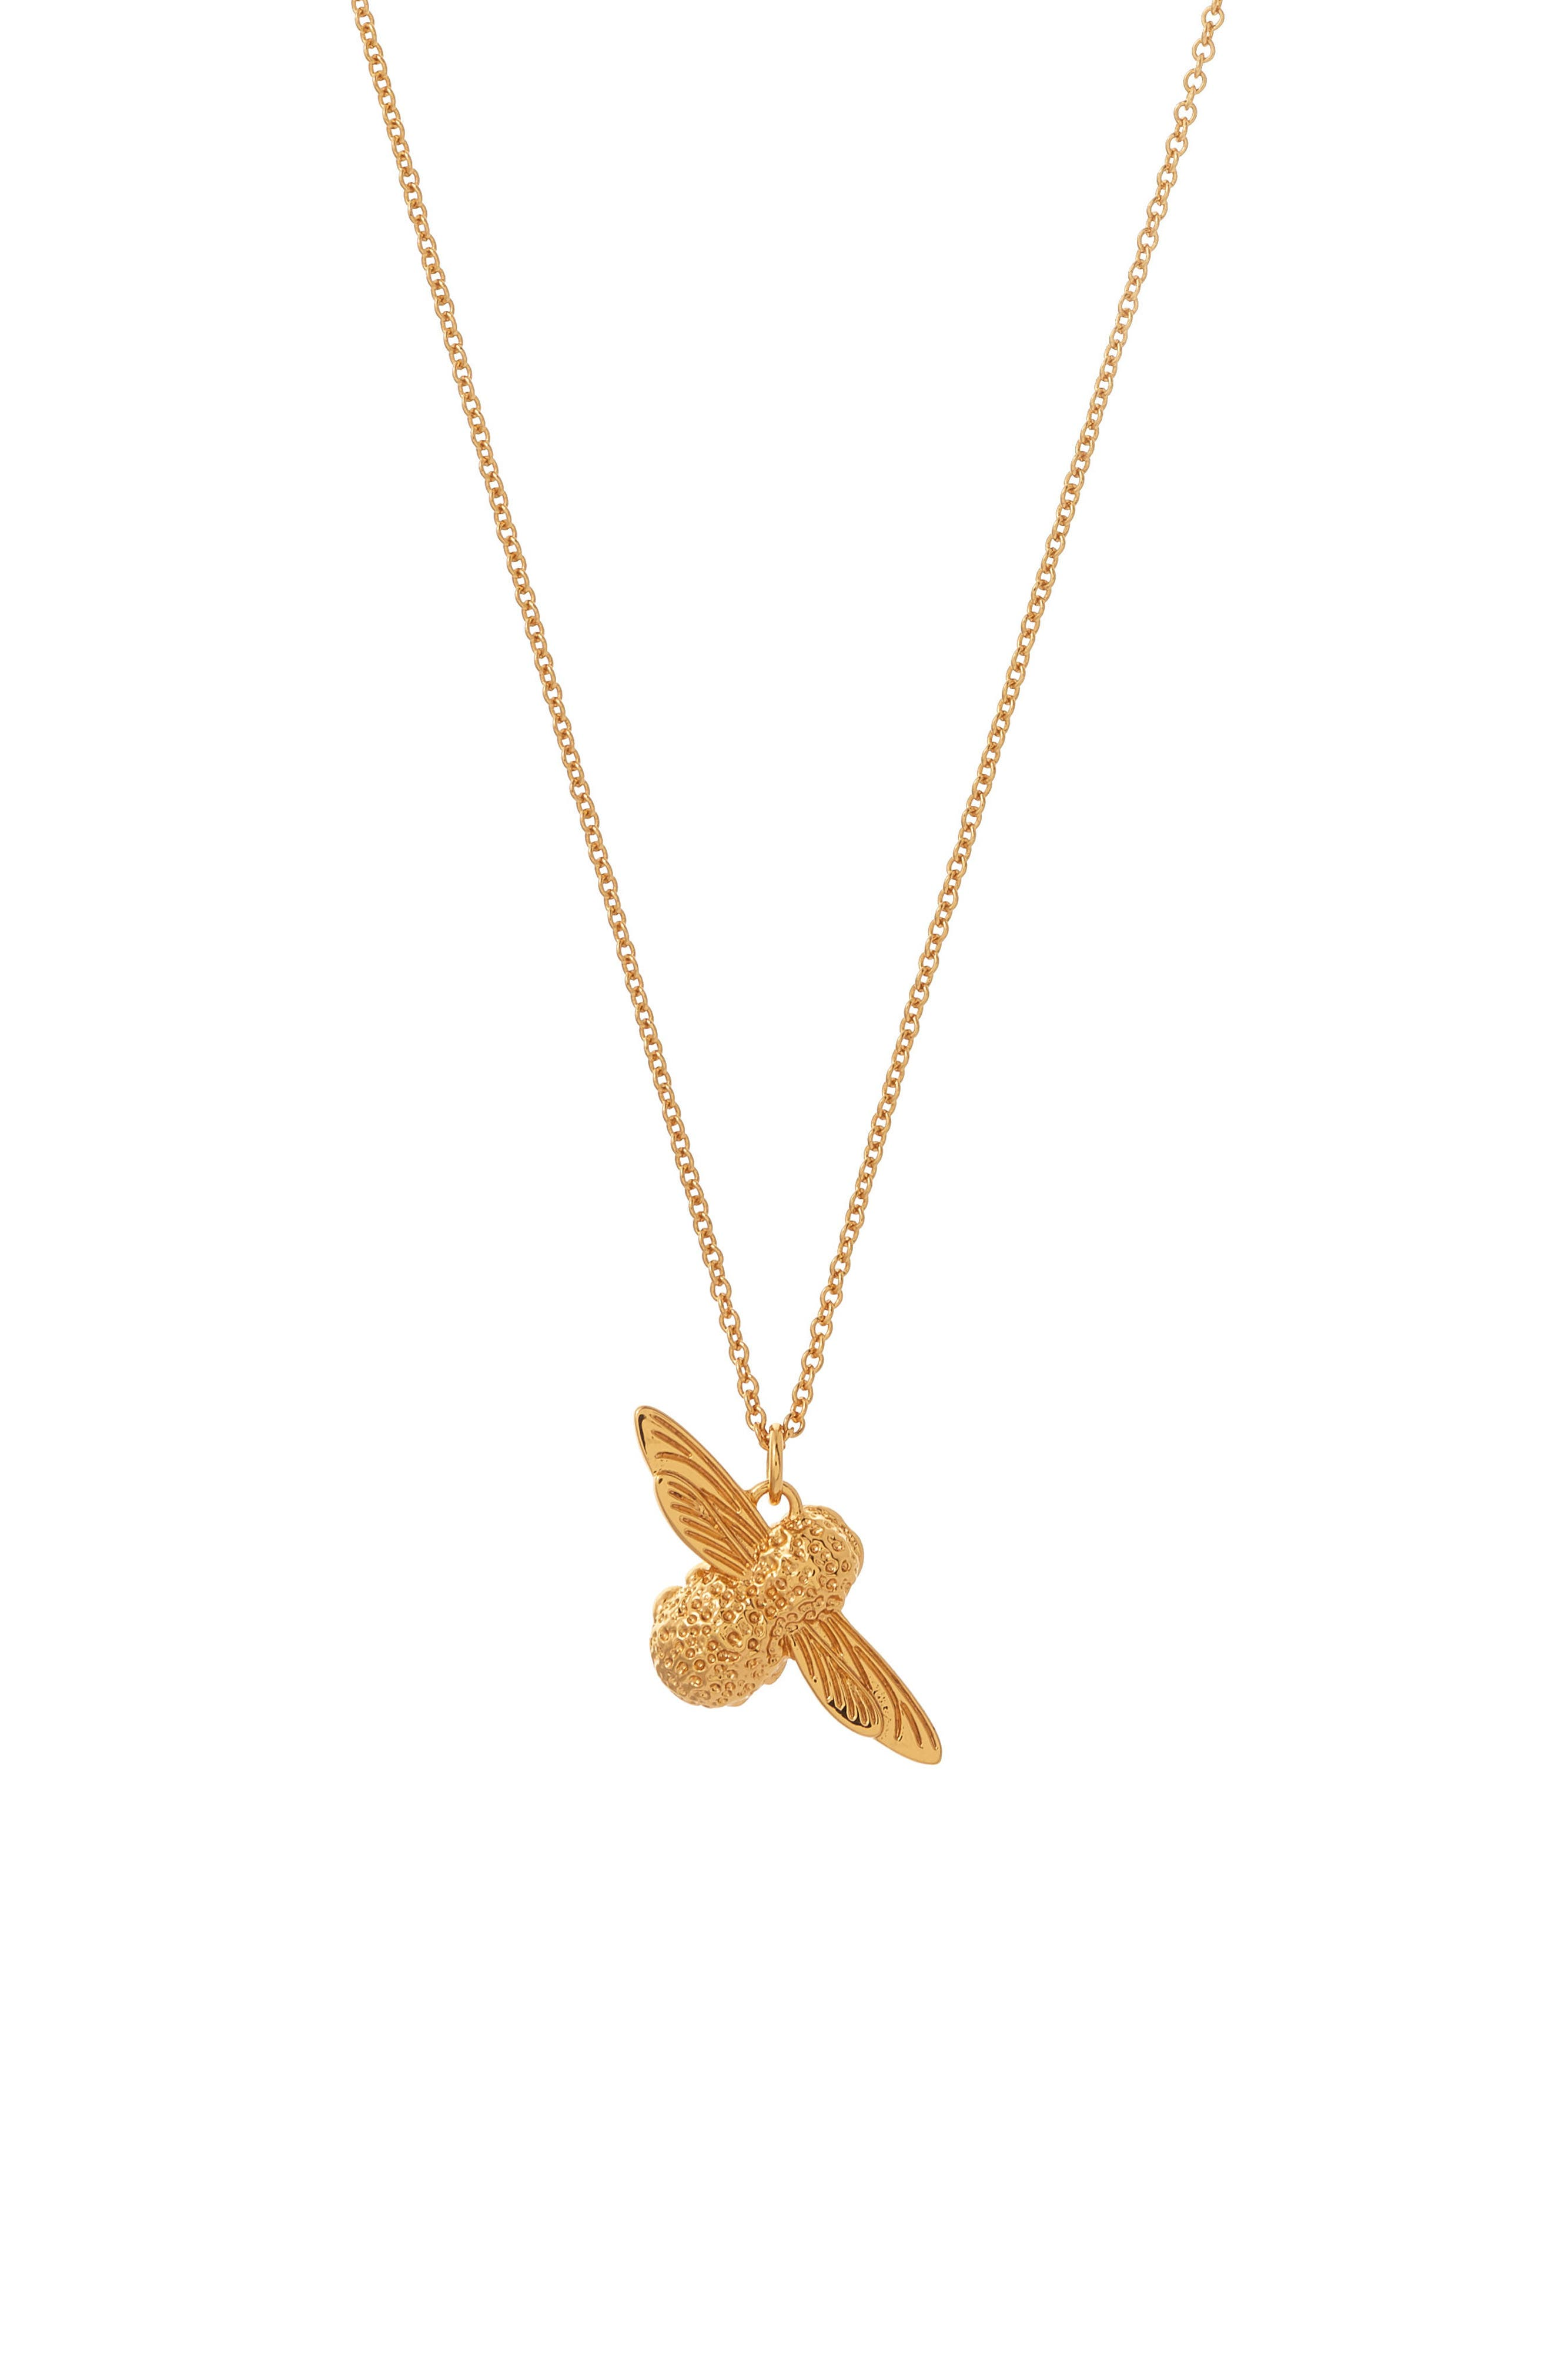 3D Bee Pendant Necklace,                             Main thumbnail 1, color,                             Gold